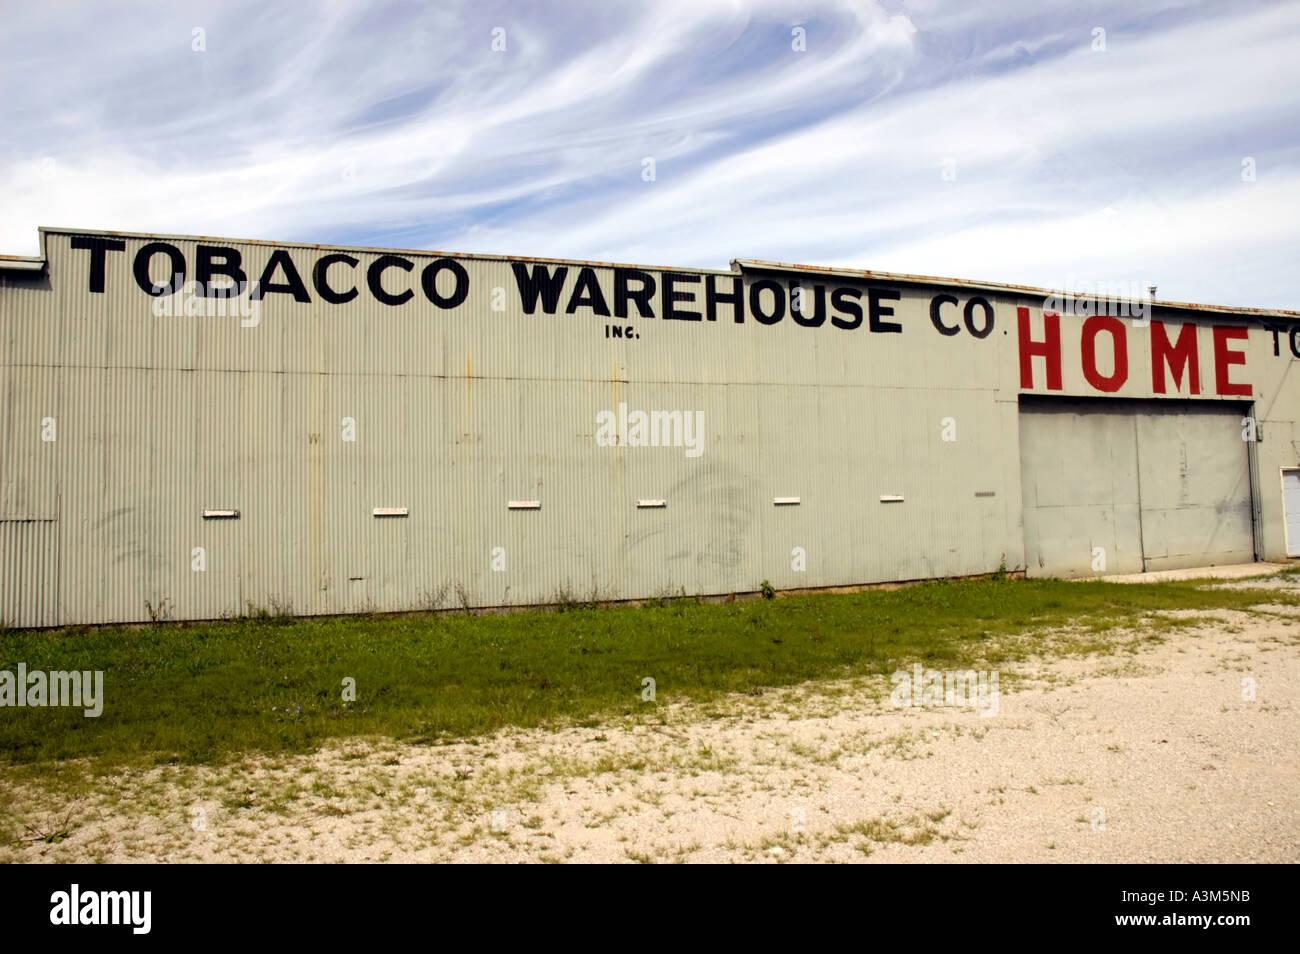 Tobacco warehouse - Stock Image